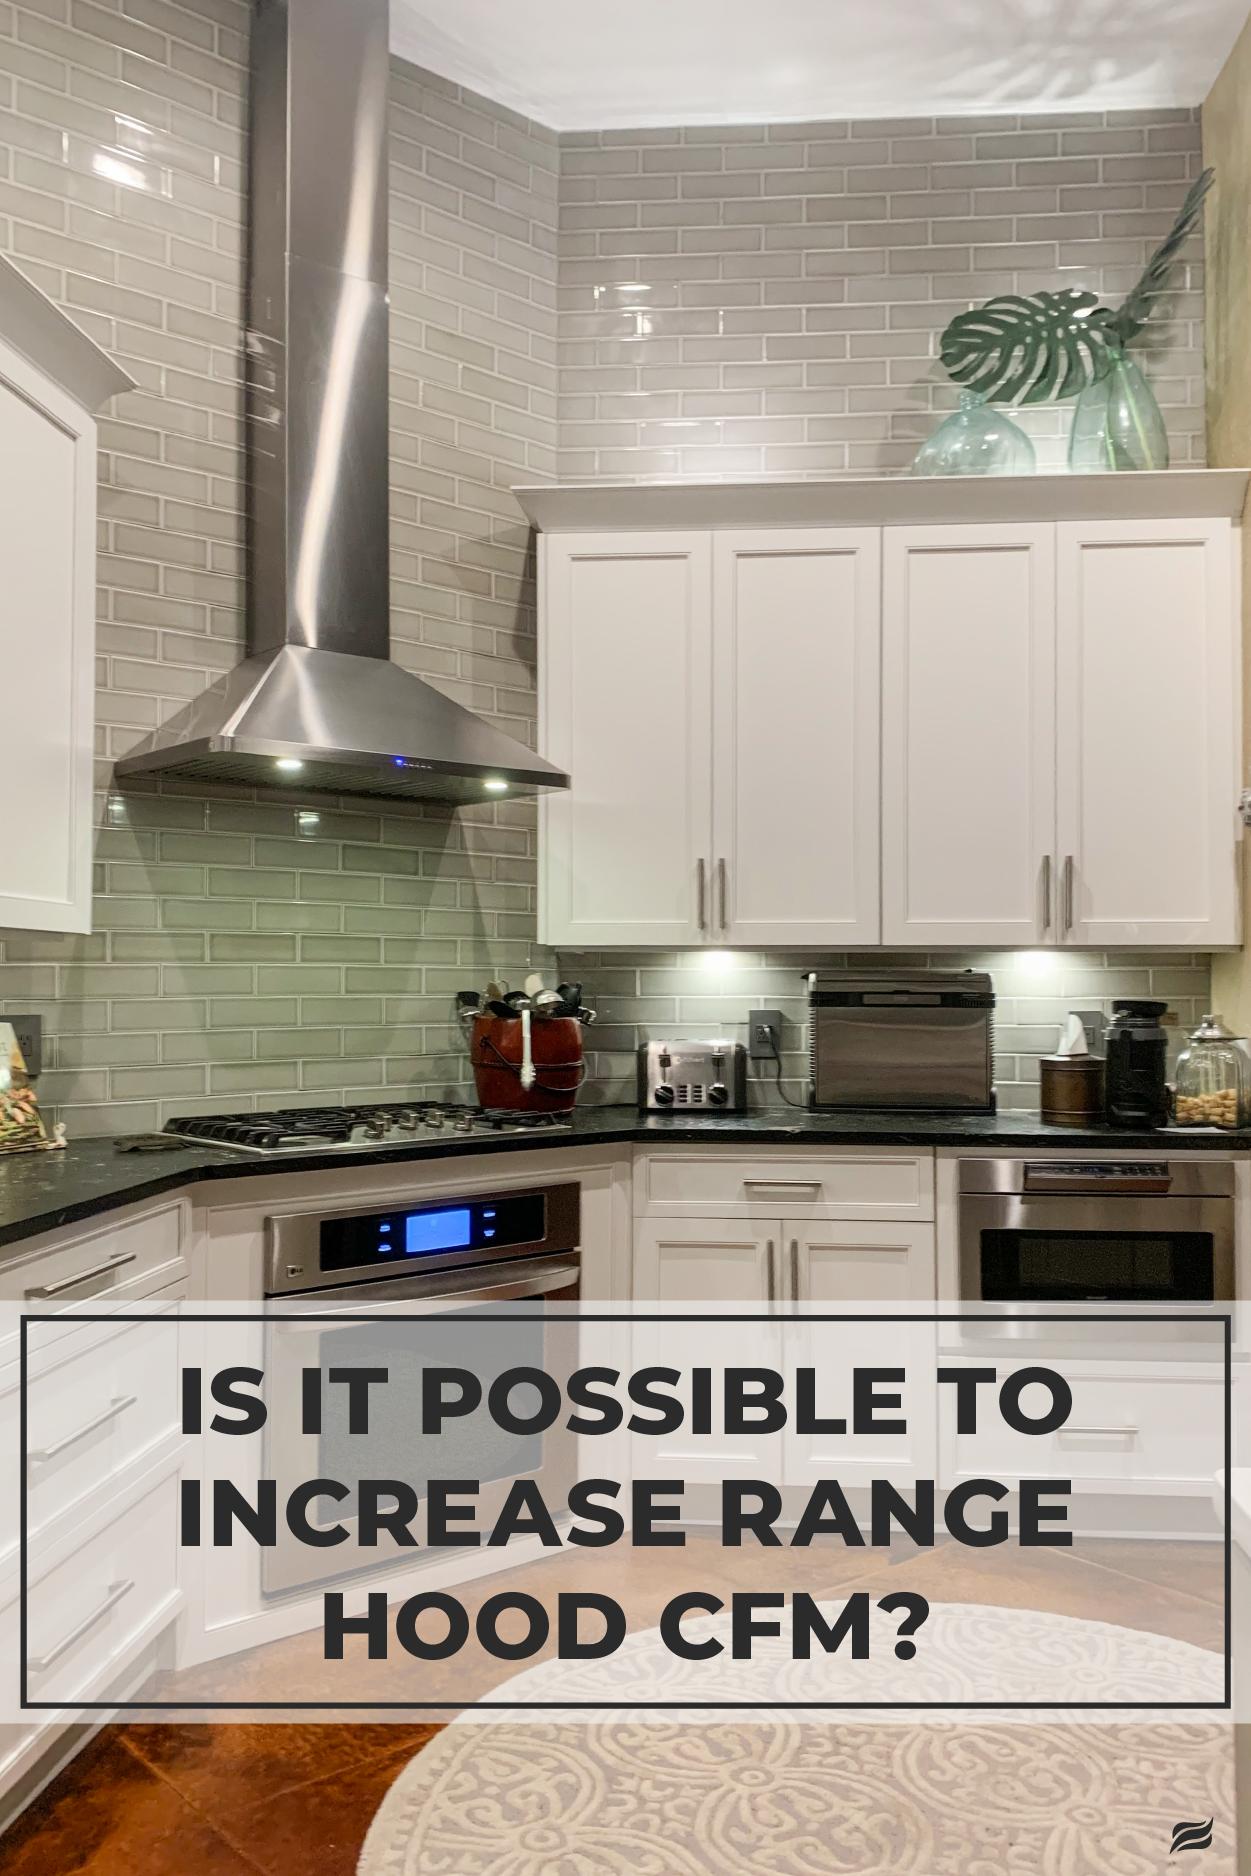 Can You Increase Range Hood Cfm Range Hood Home Remodeling Home